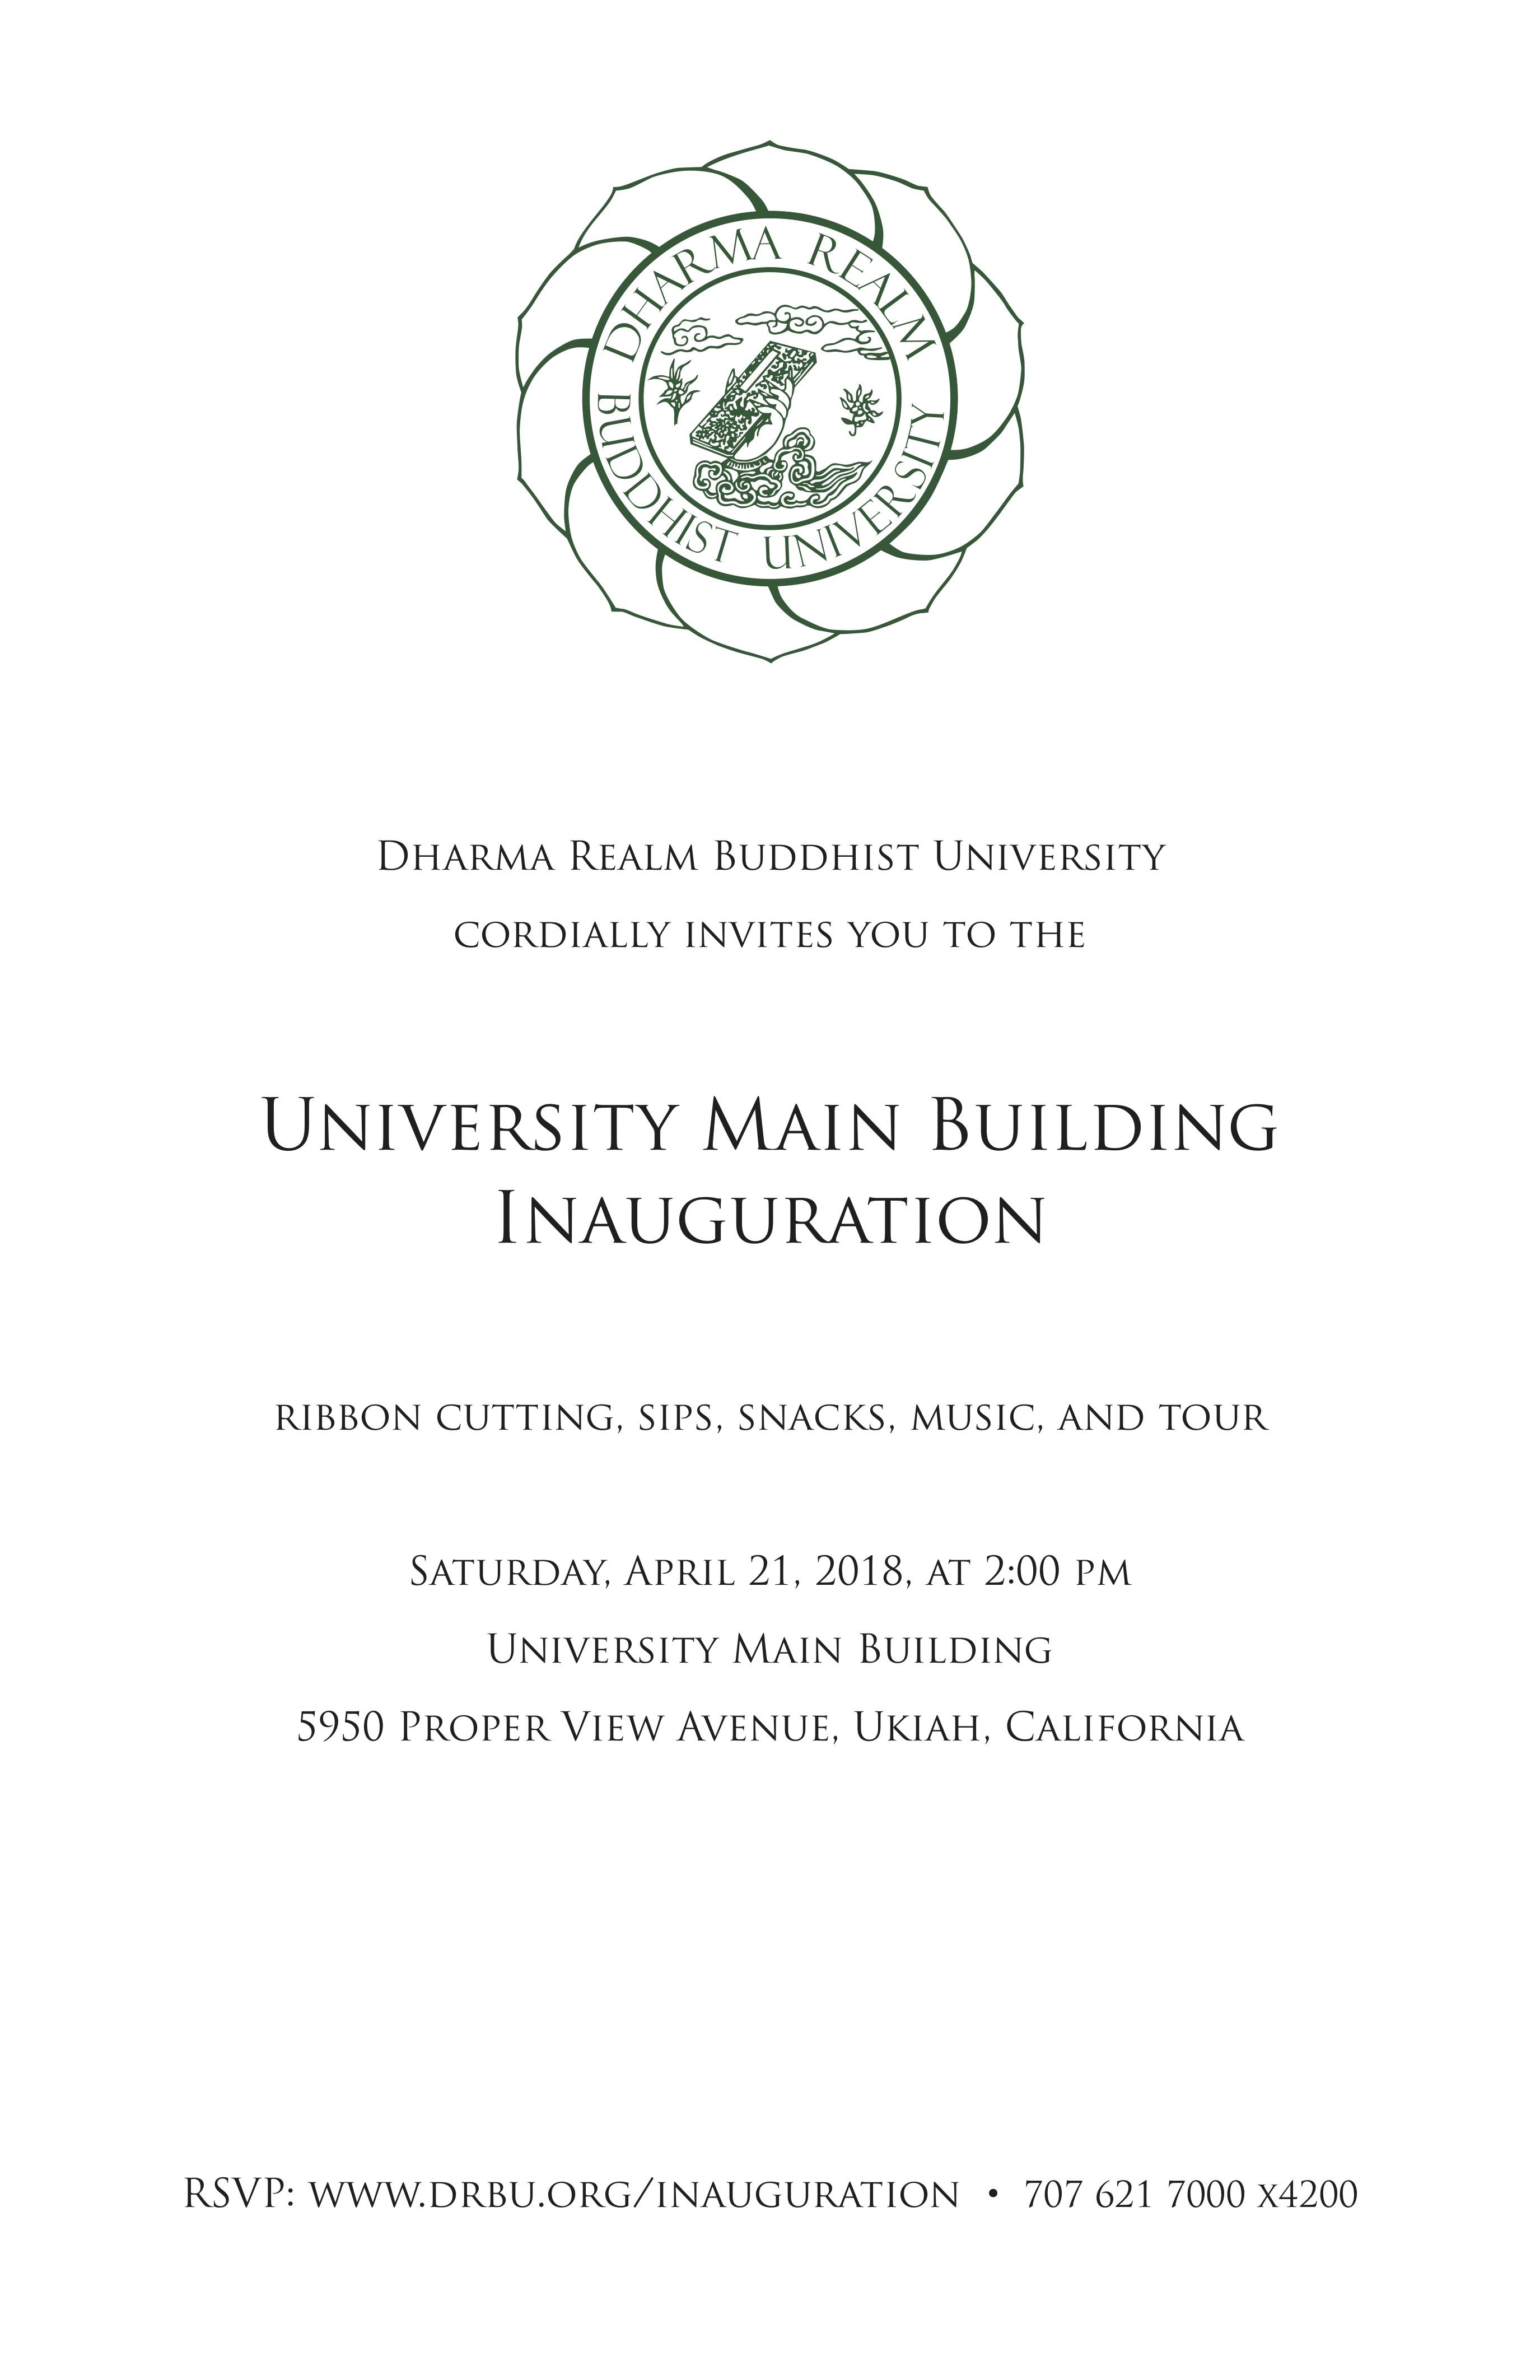 University Main Building Inauguration Drbu